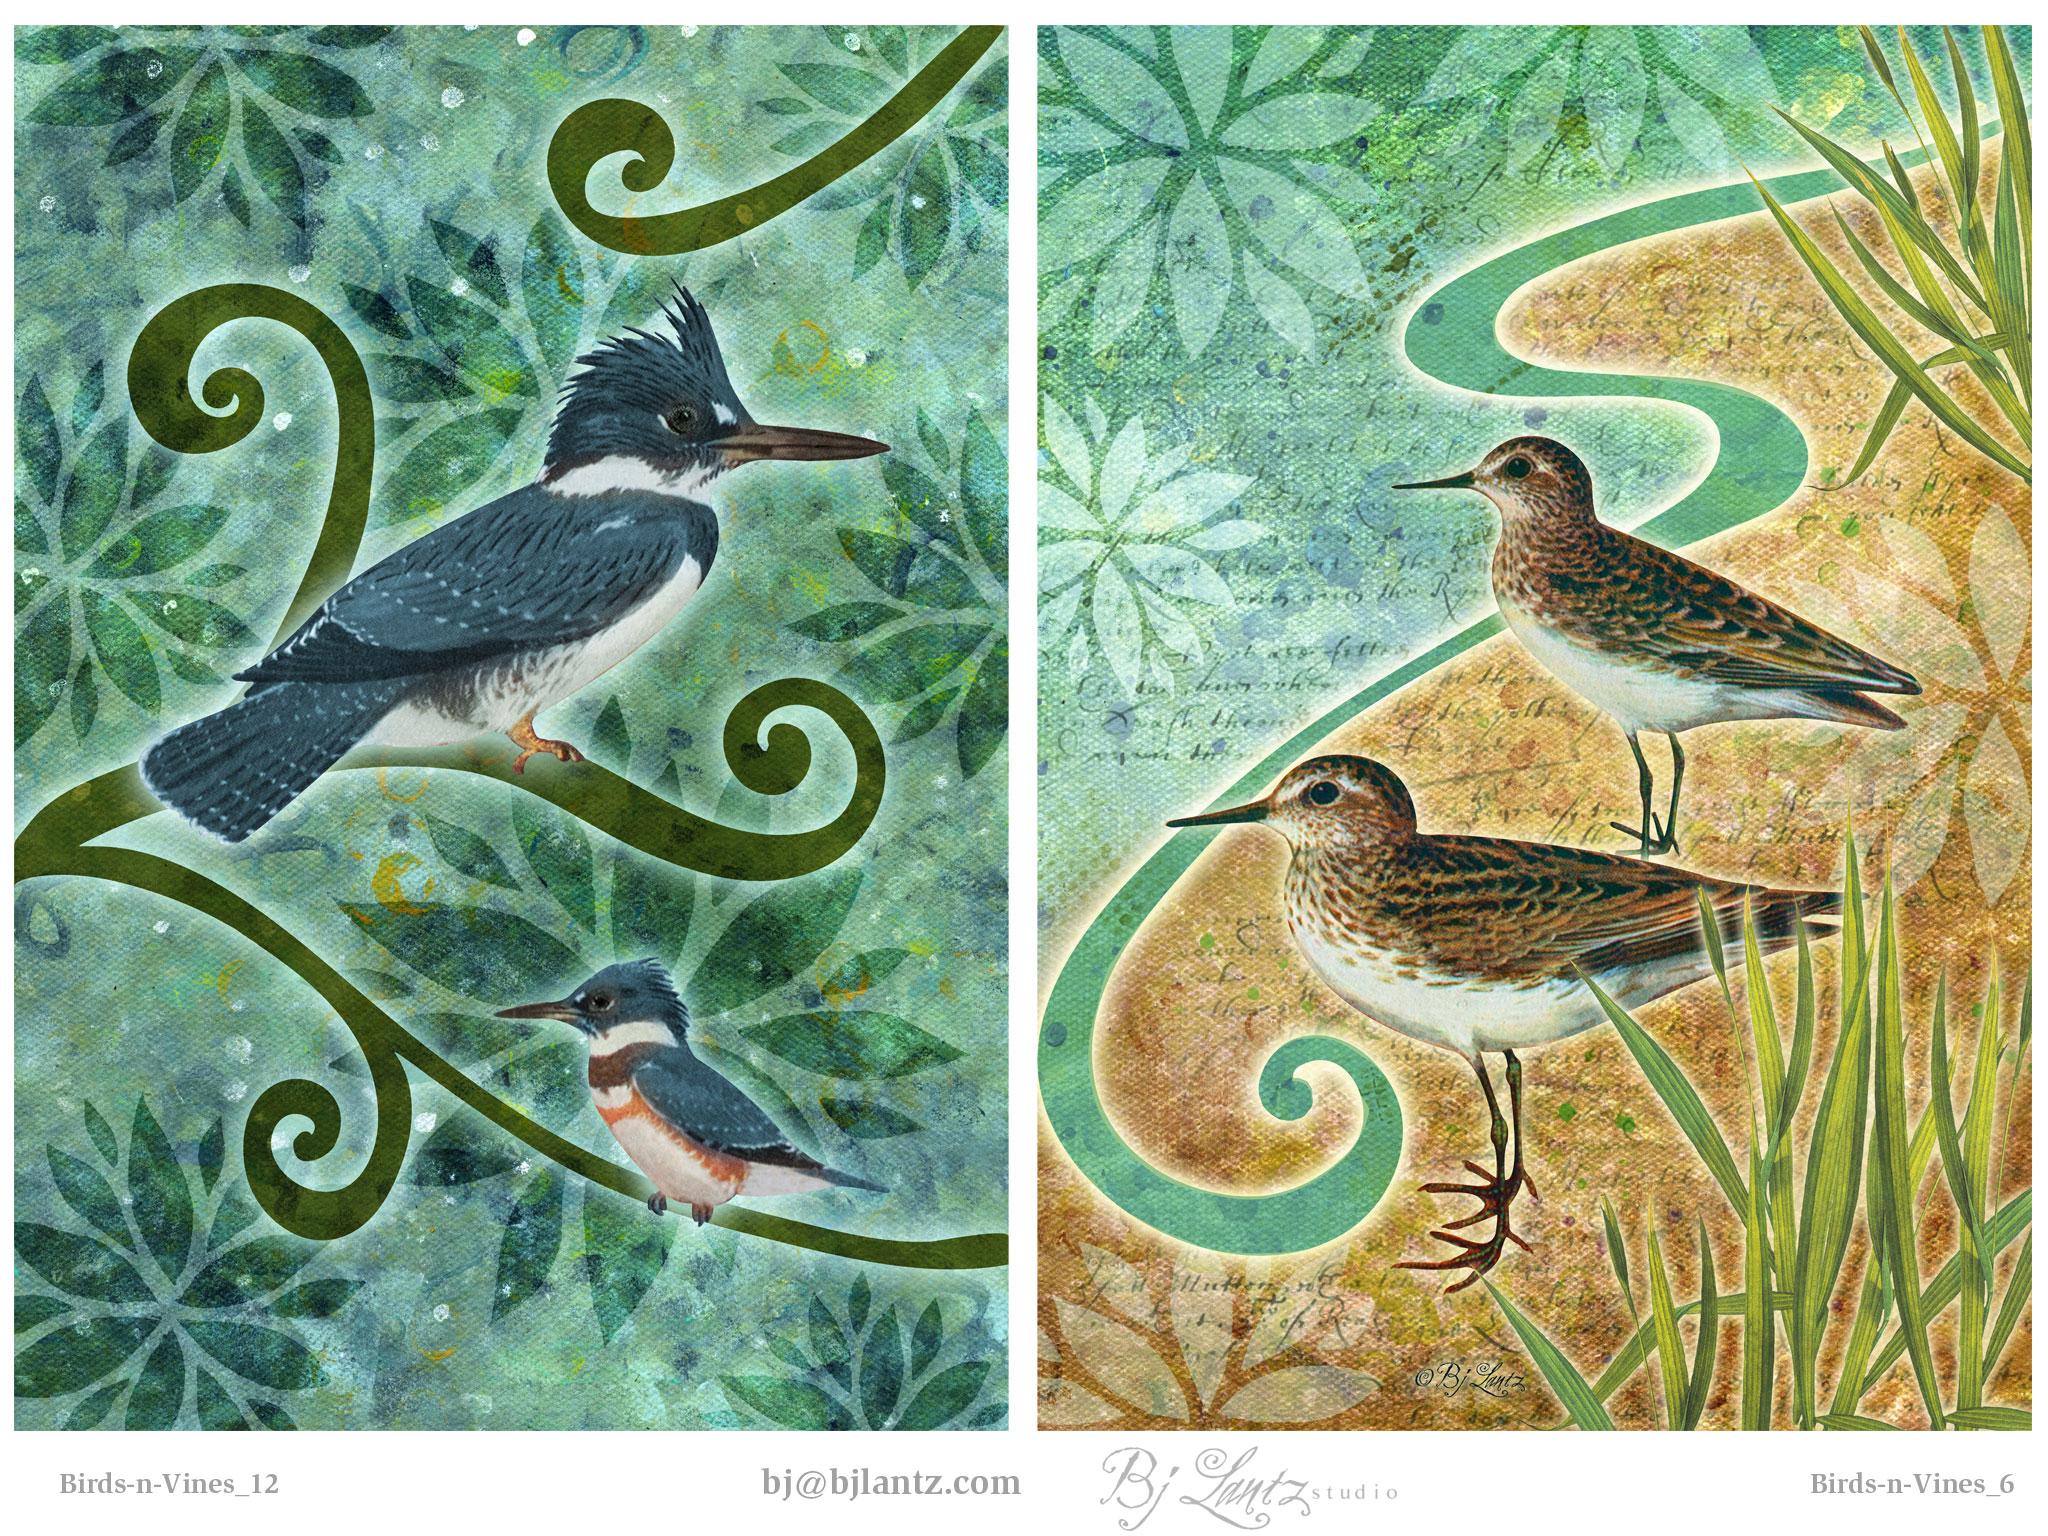 Birds-n-Vines_BJLantz_3.jpg